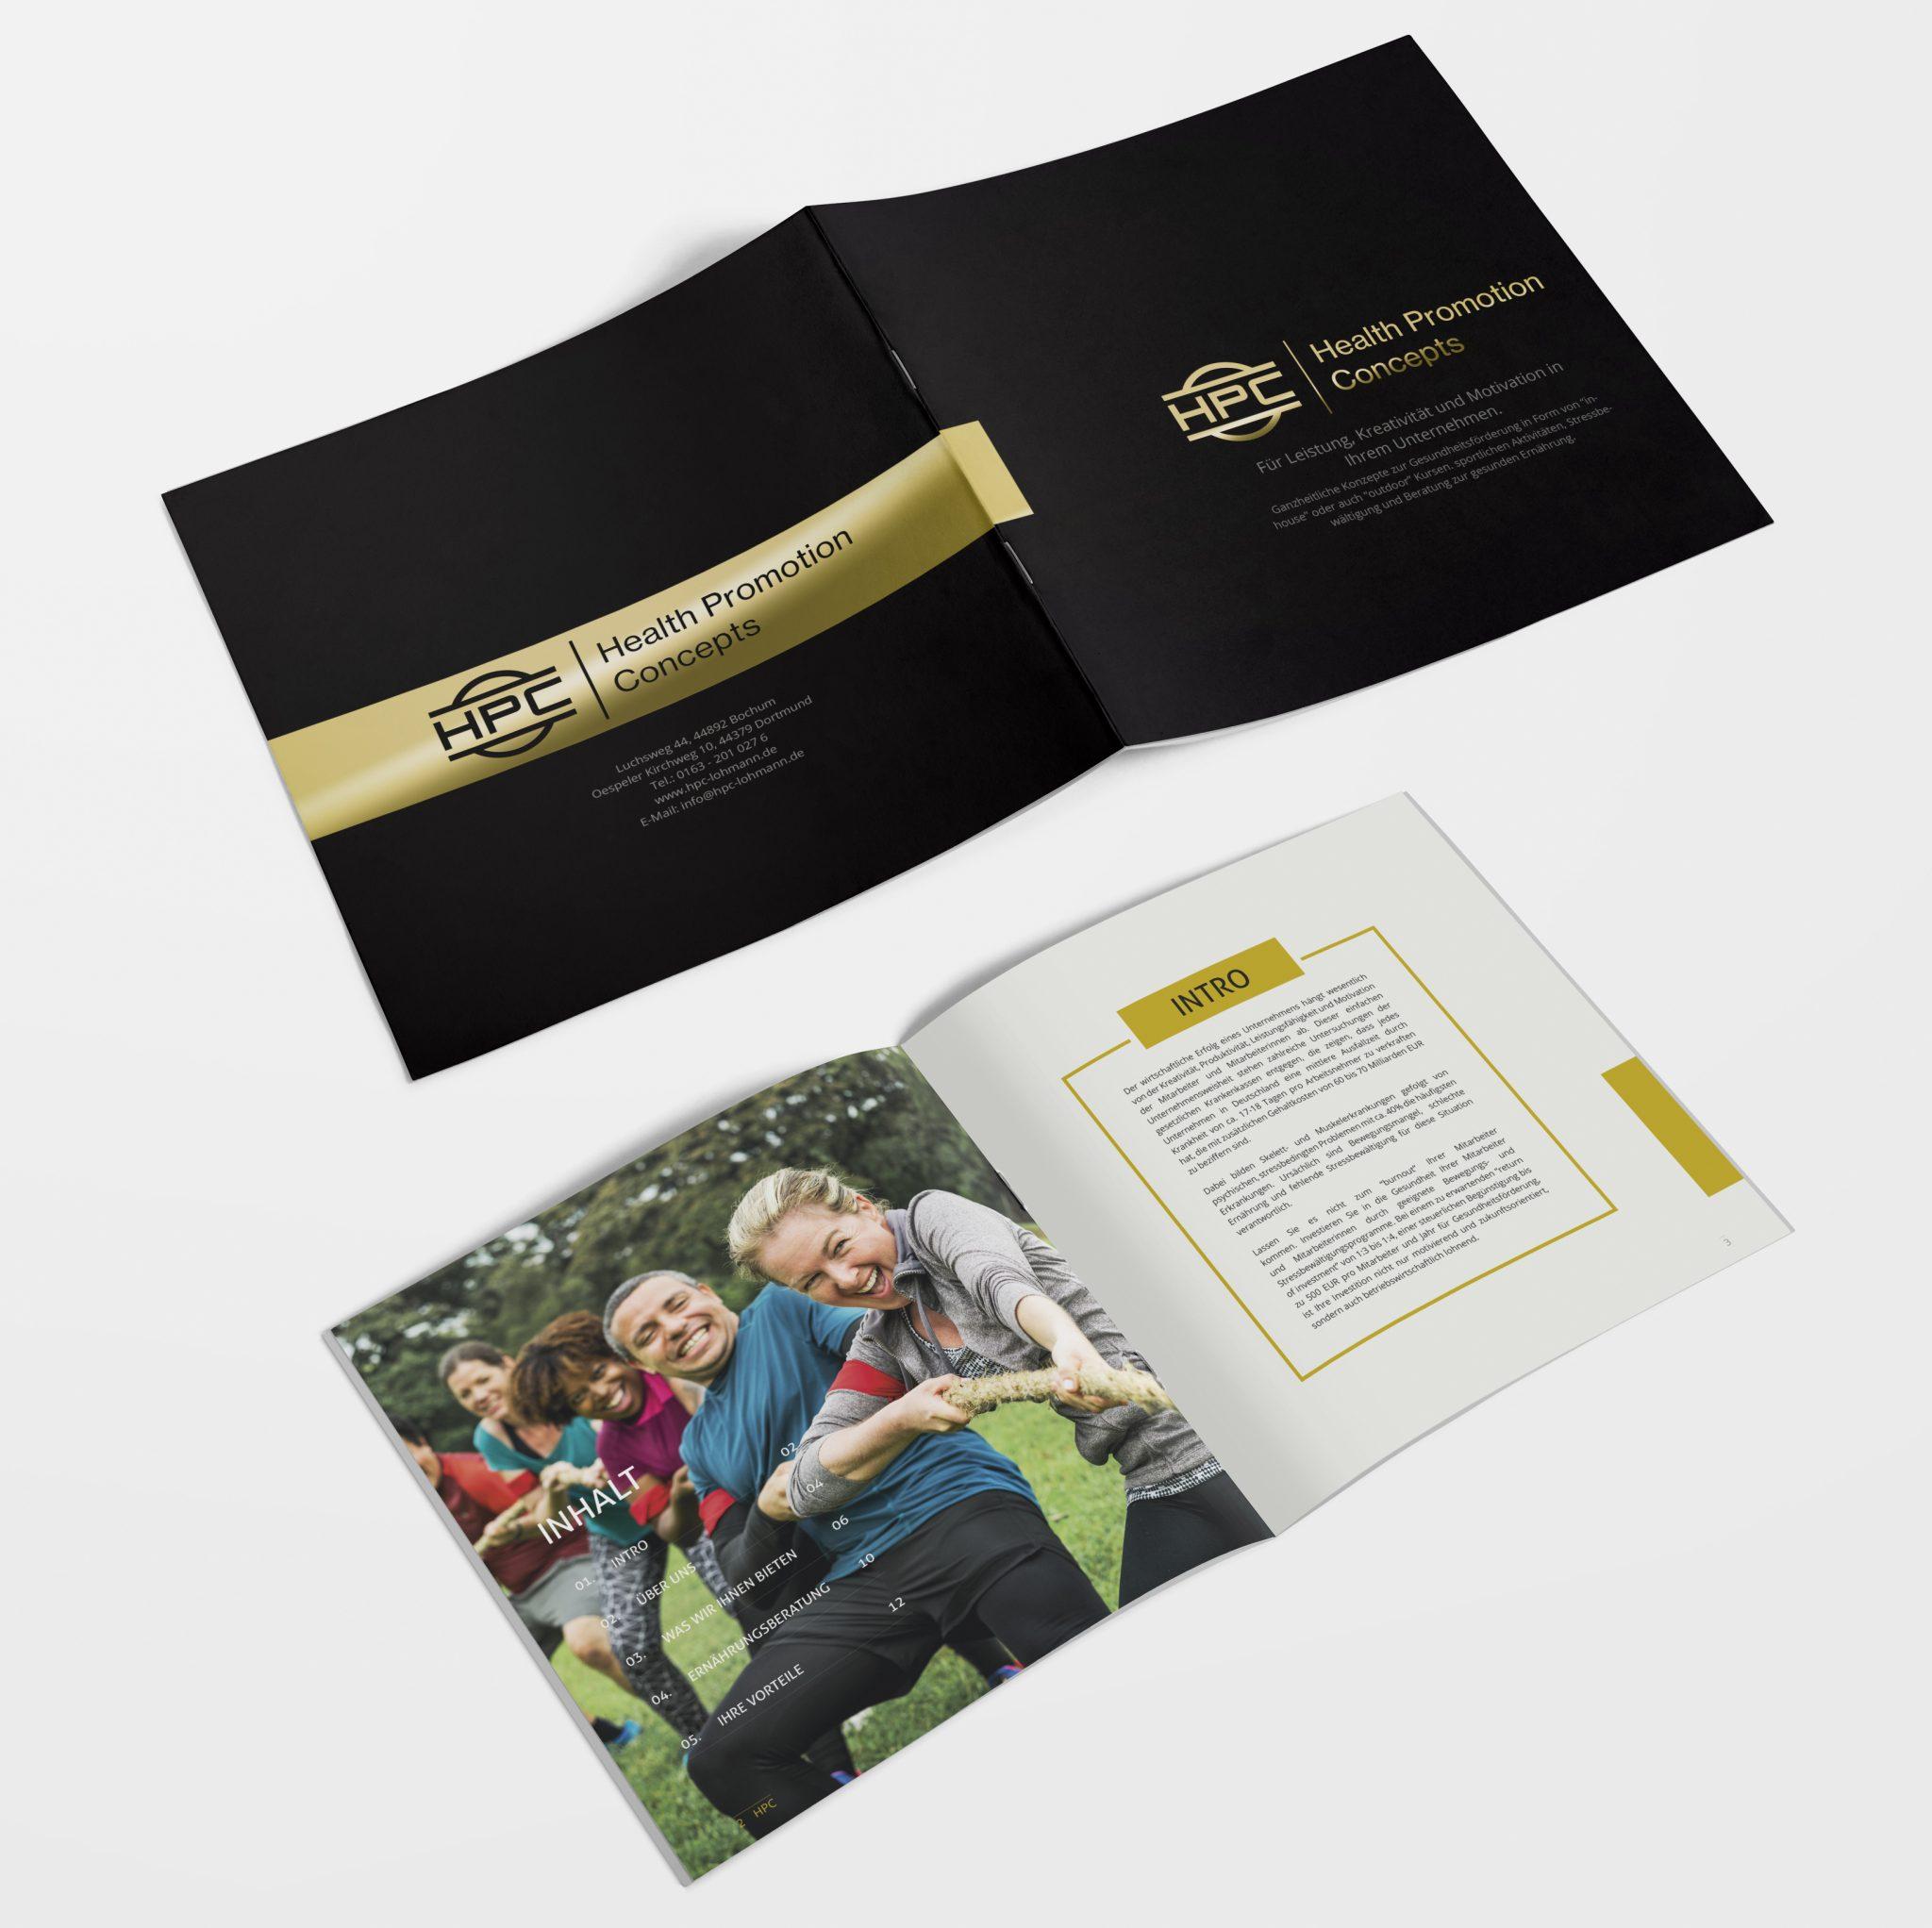 hpc katalog kpl